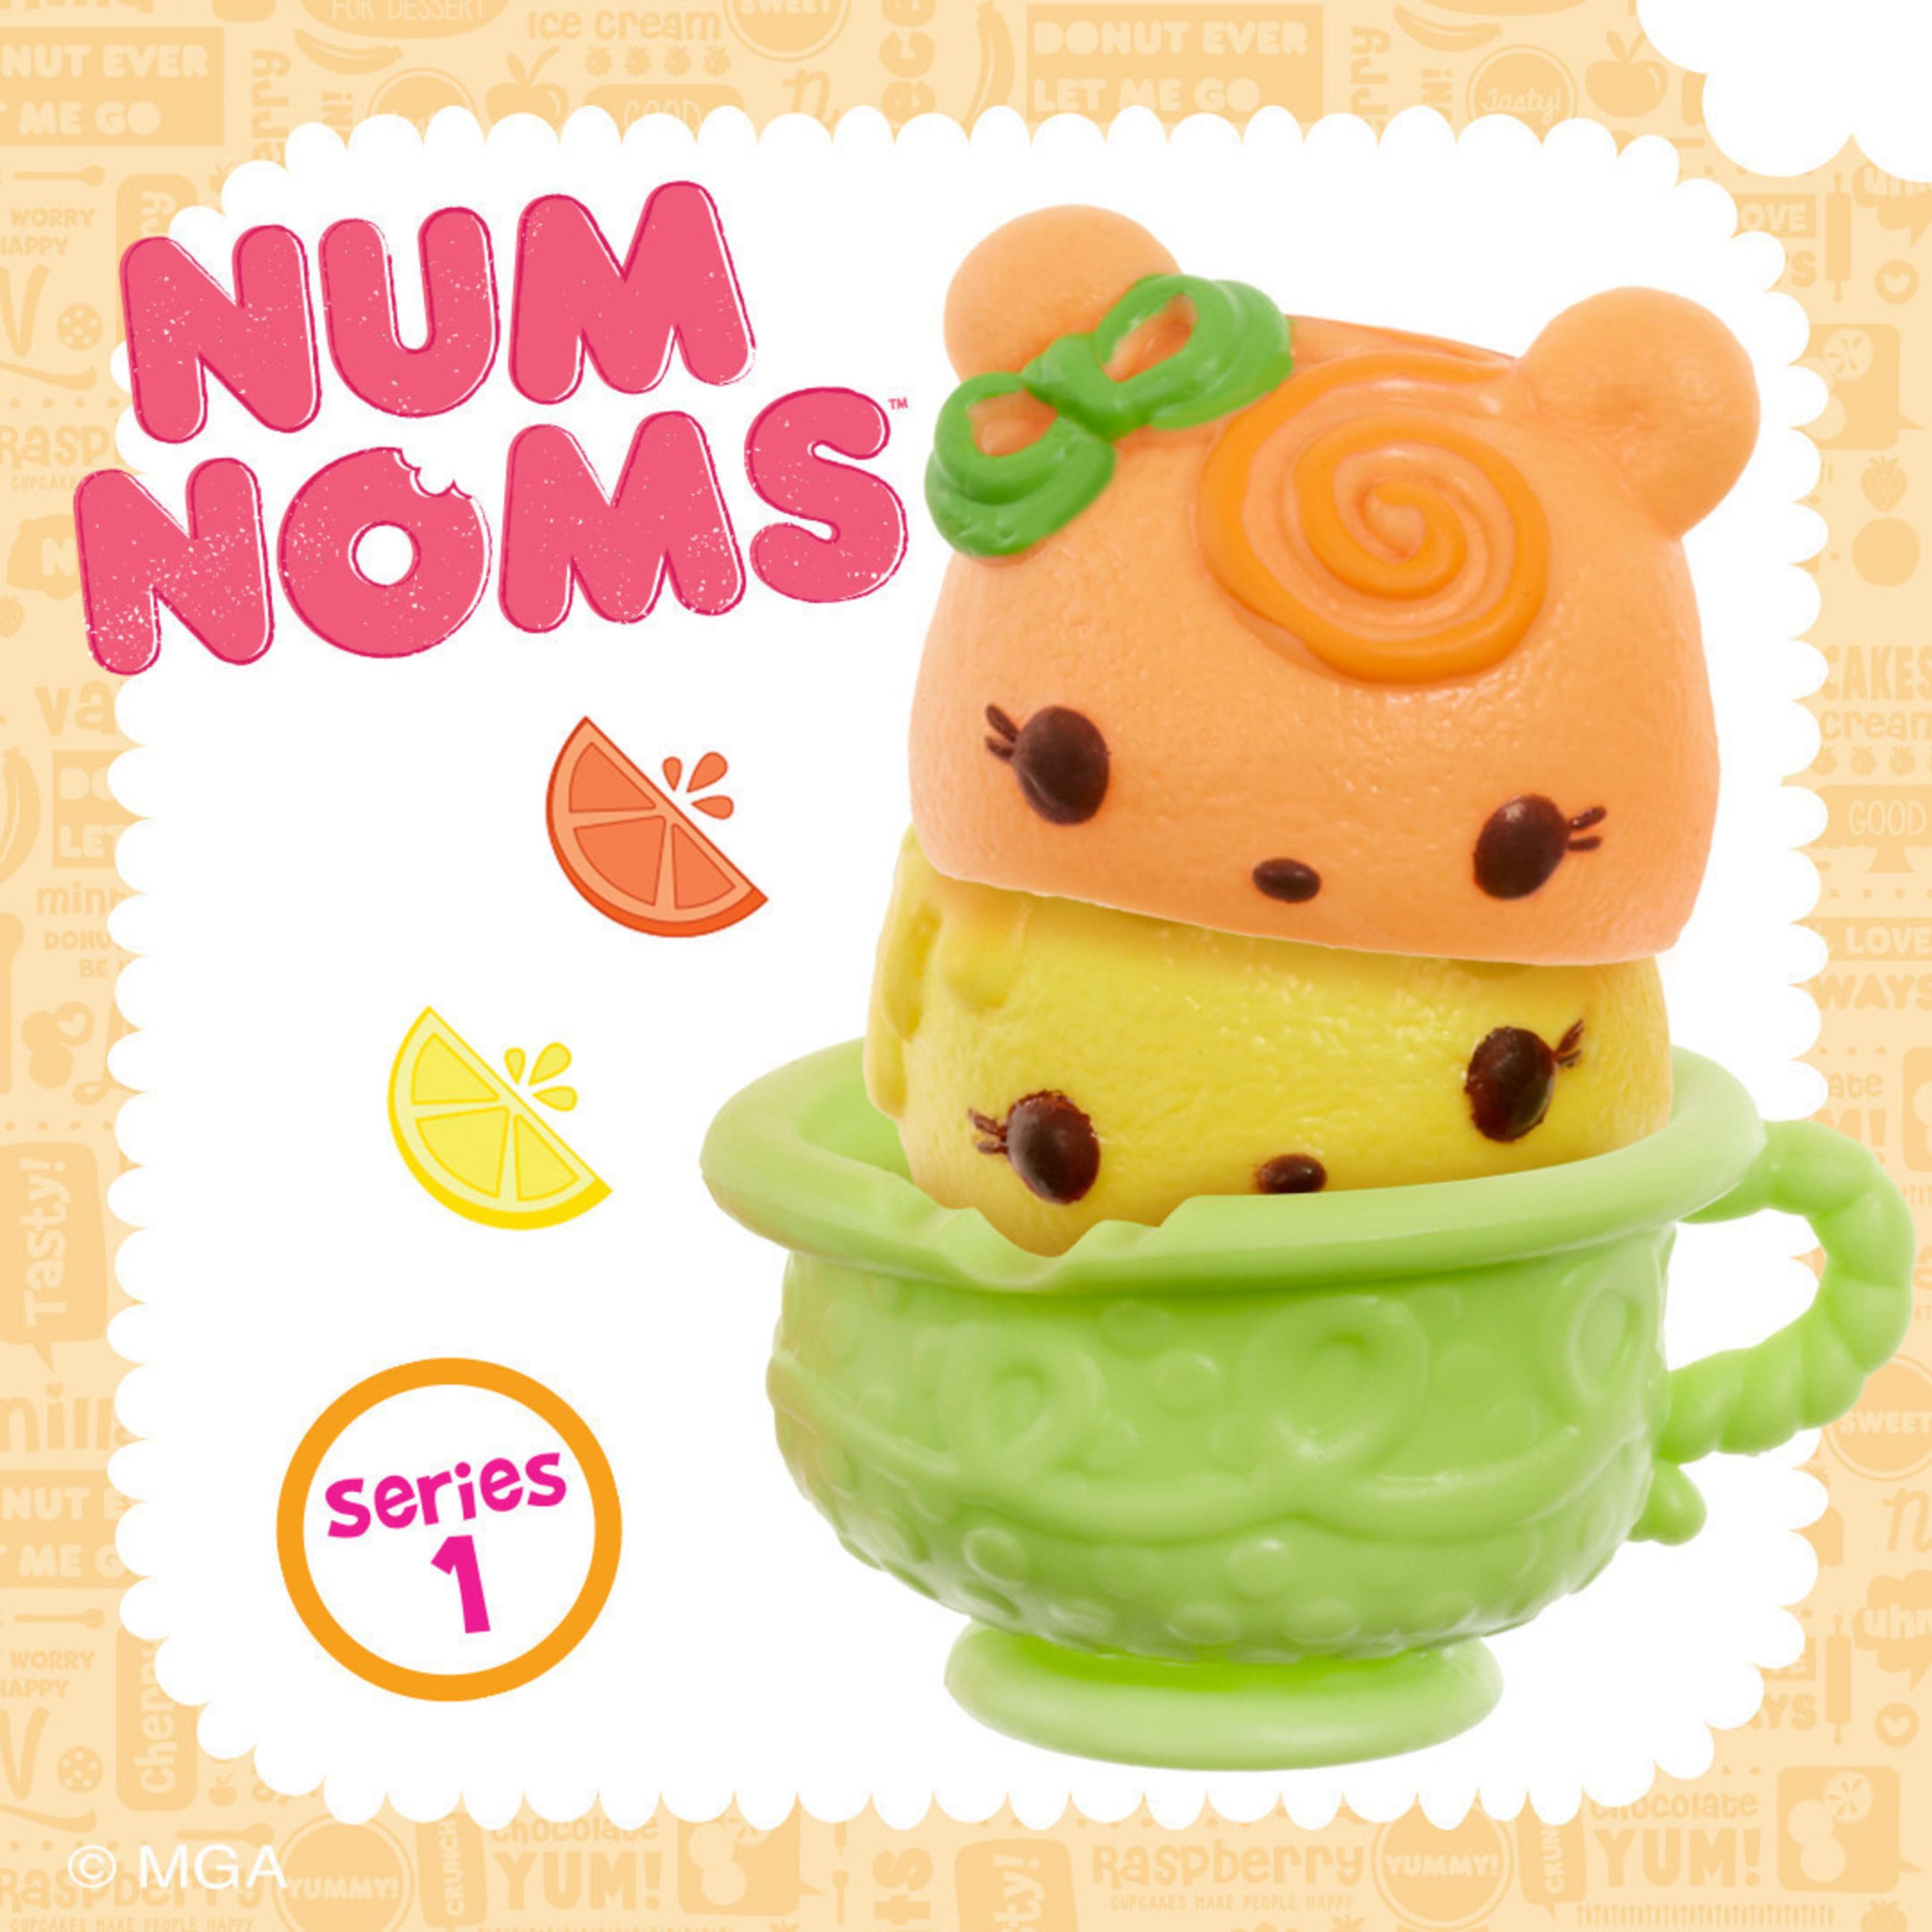 /Collectables Banana Split Ice Cream Num Noms/